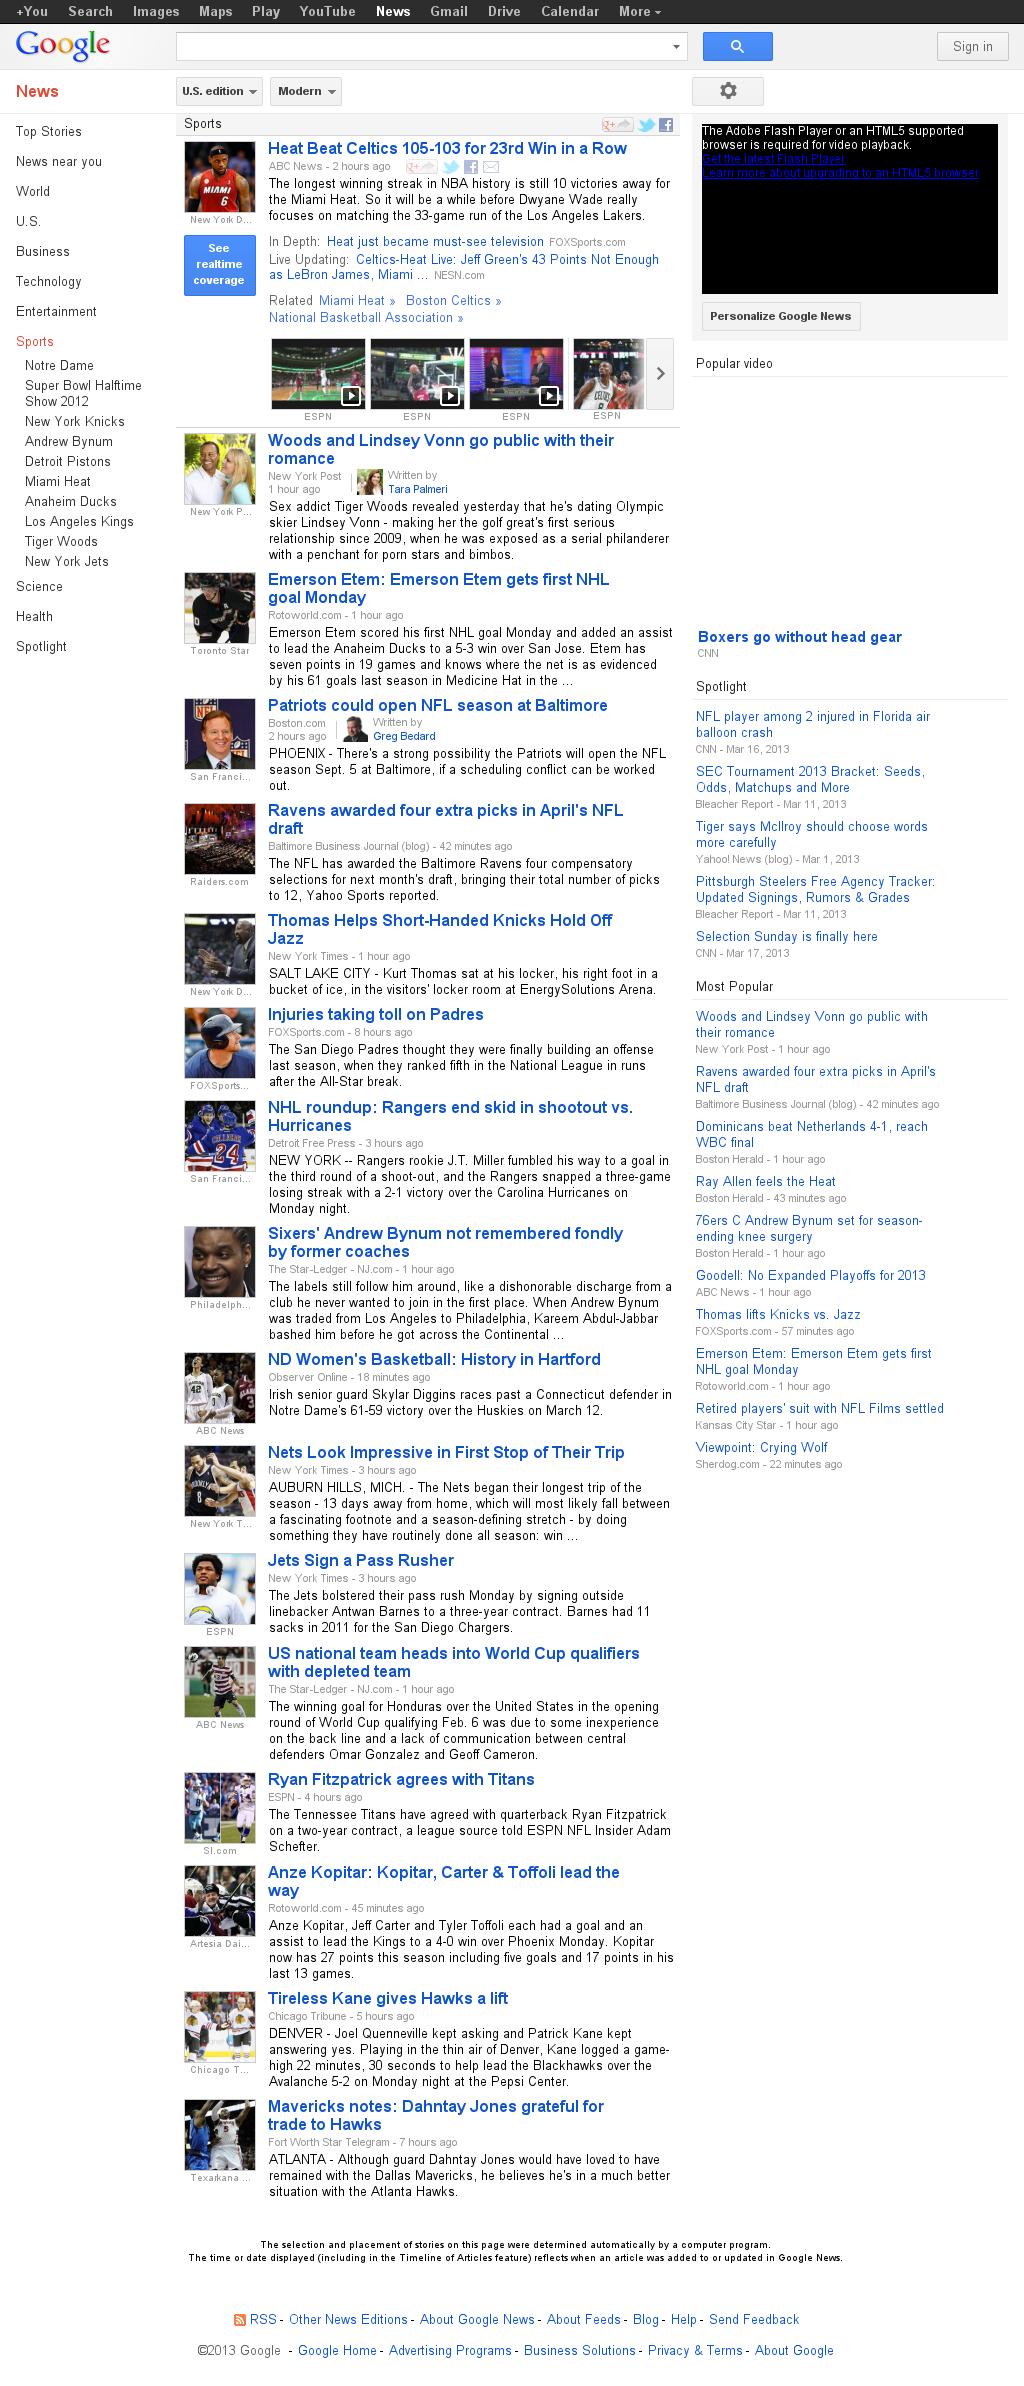 Google News: Sports at Tuesday March 19, 2013, 10:10 a.m. UTC